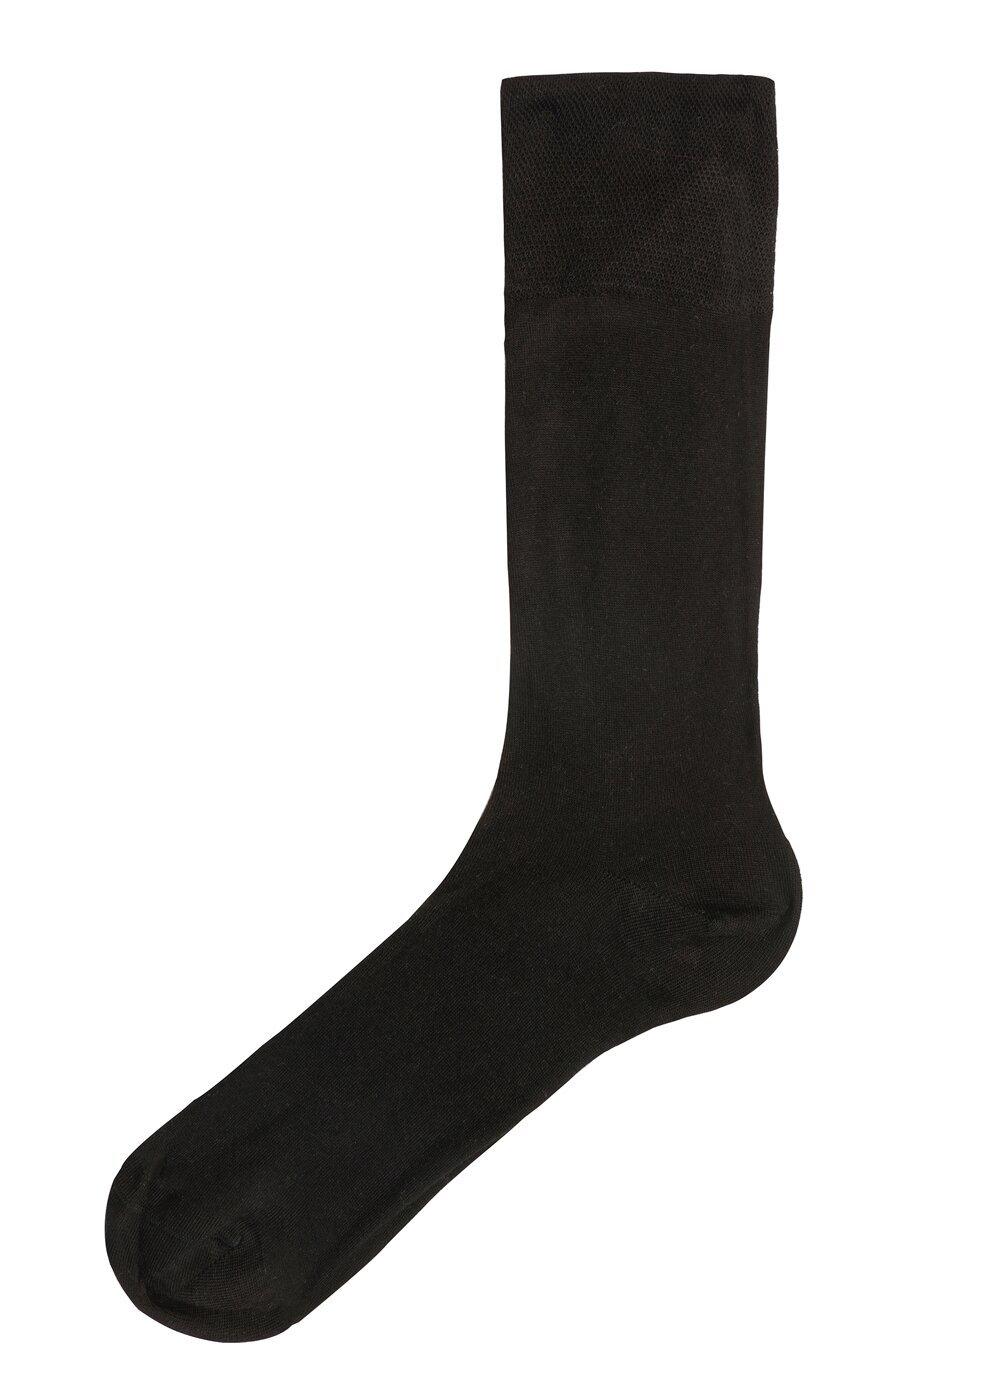 resm Erkek Bambu Çorap - SİYAH